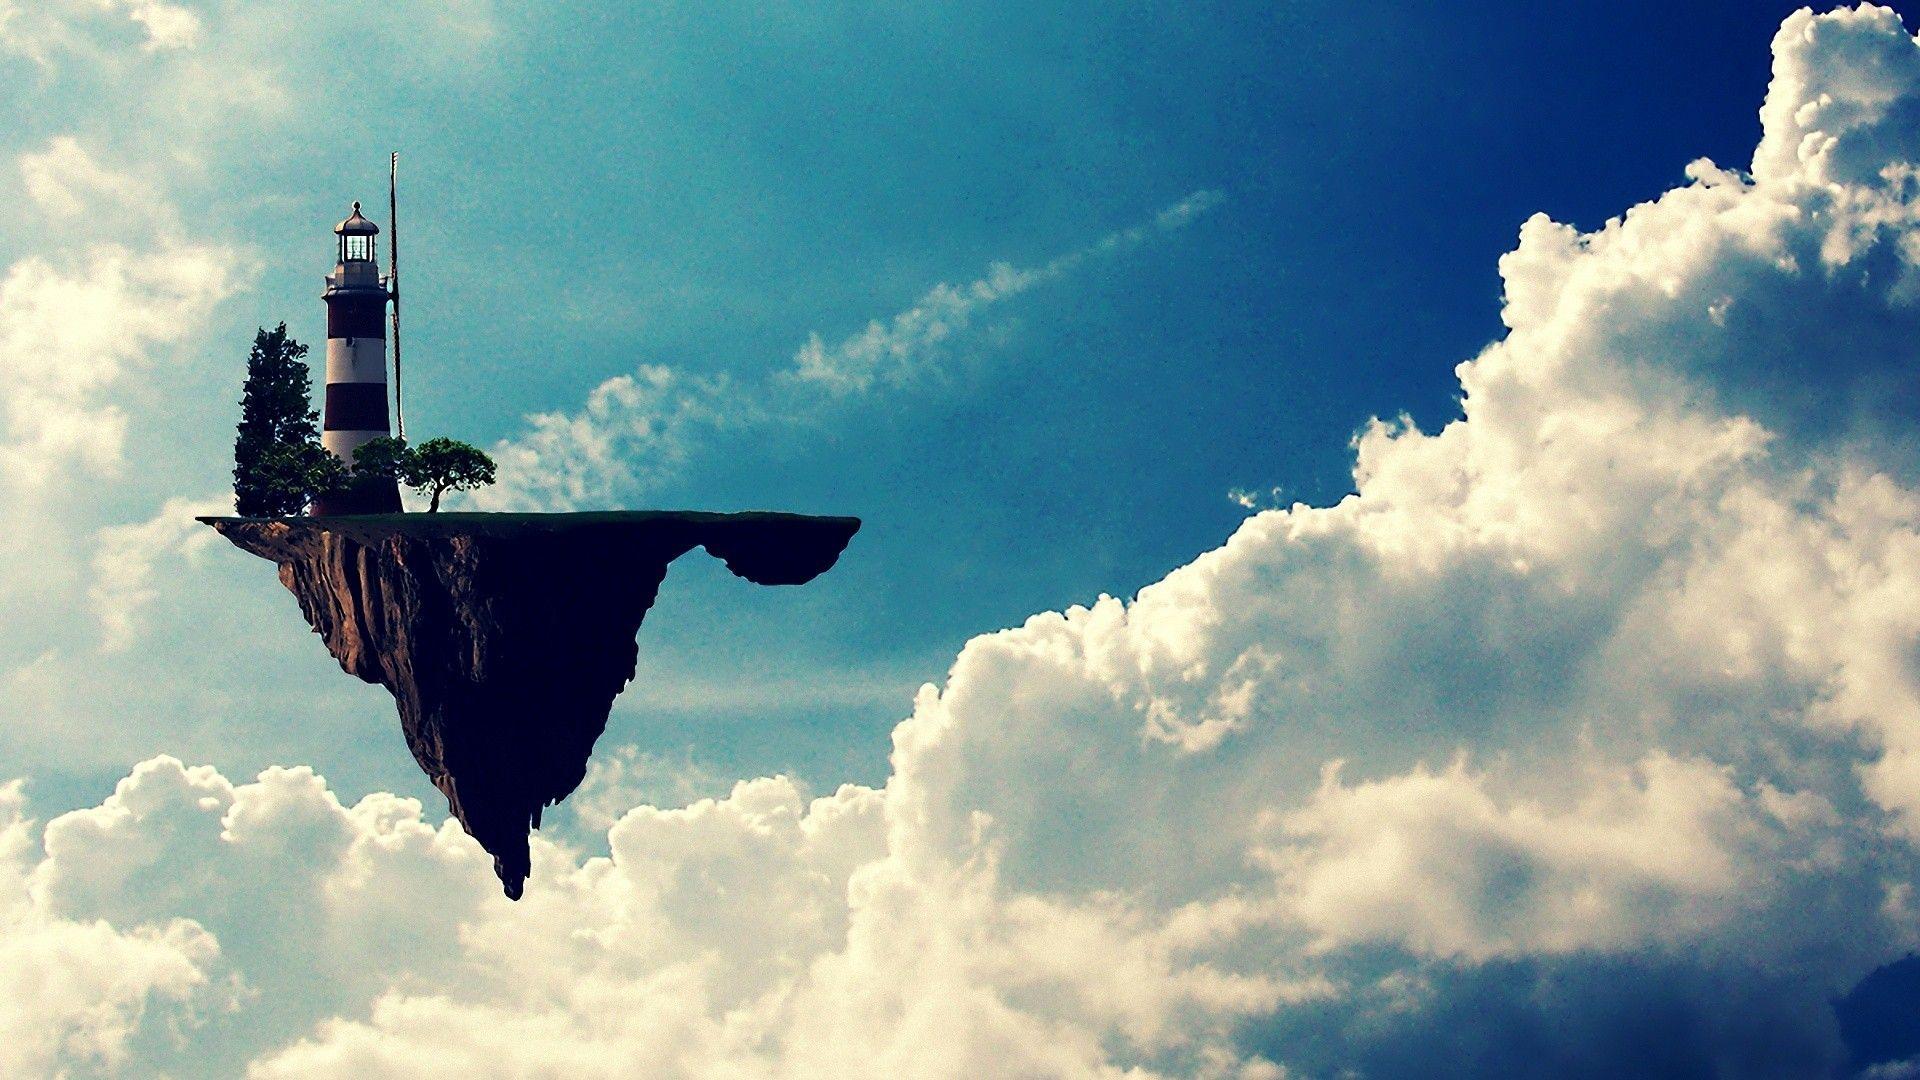 clouds Gorillaz lighthouses fantasy art floating island